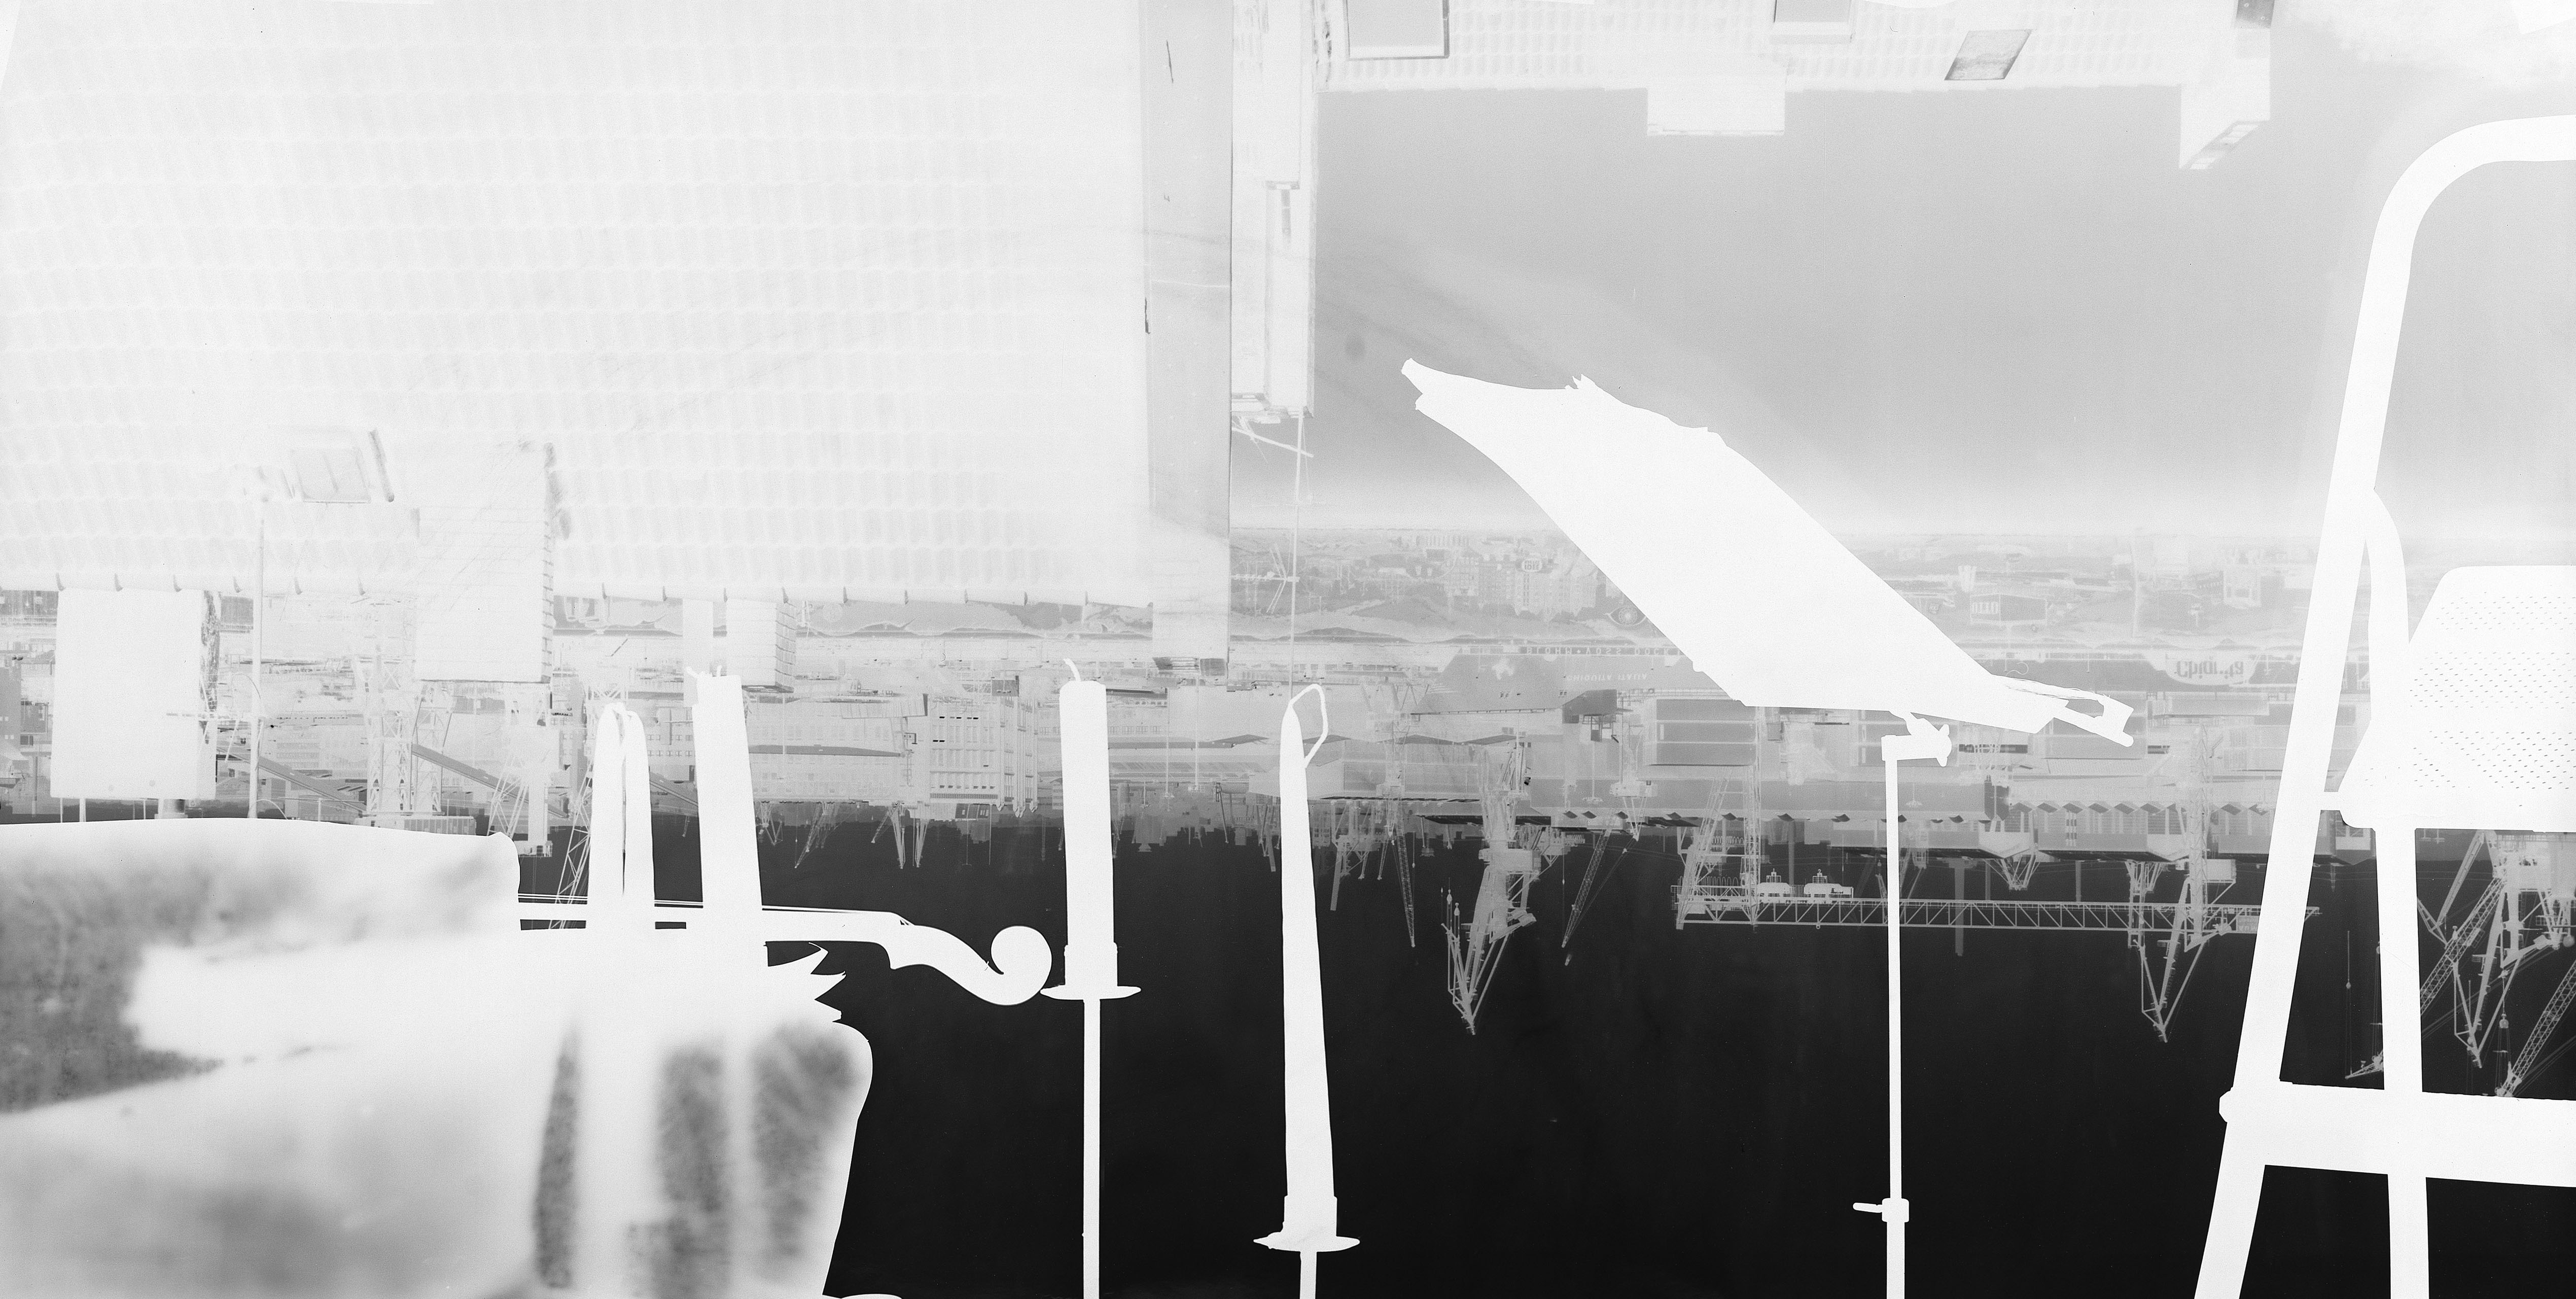 1_Lissel_Räume-Fotografische Dekonstrukt